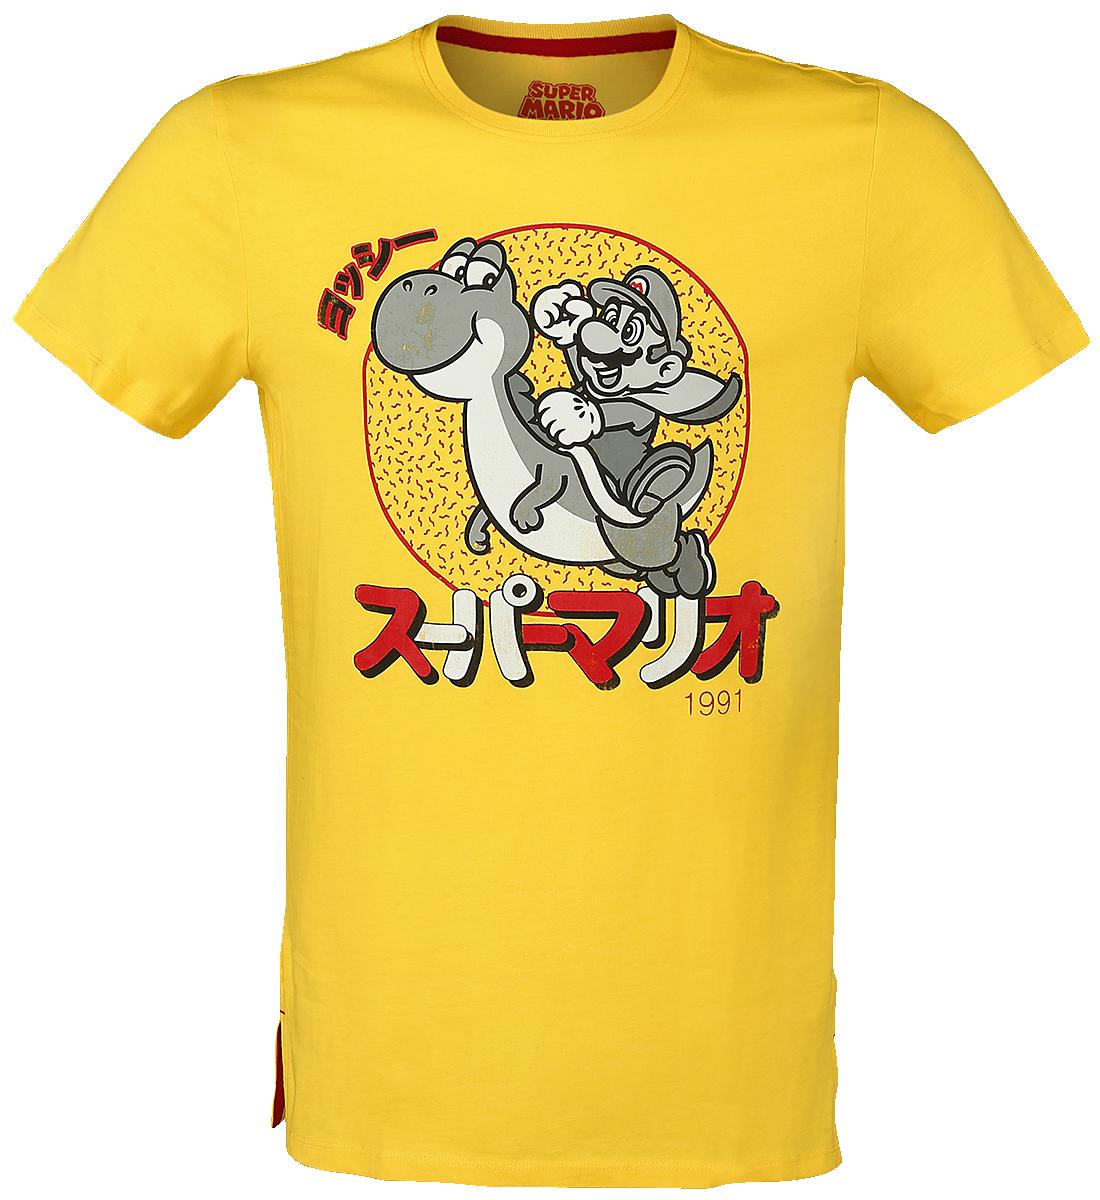 Super Mario - Mario & Yoshi - Japanese - T-Shirt - yellow image